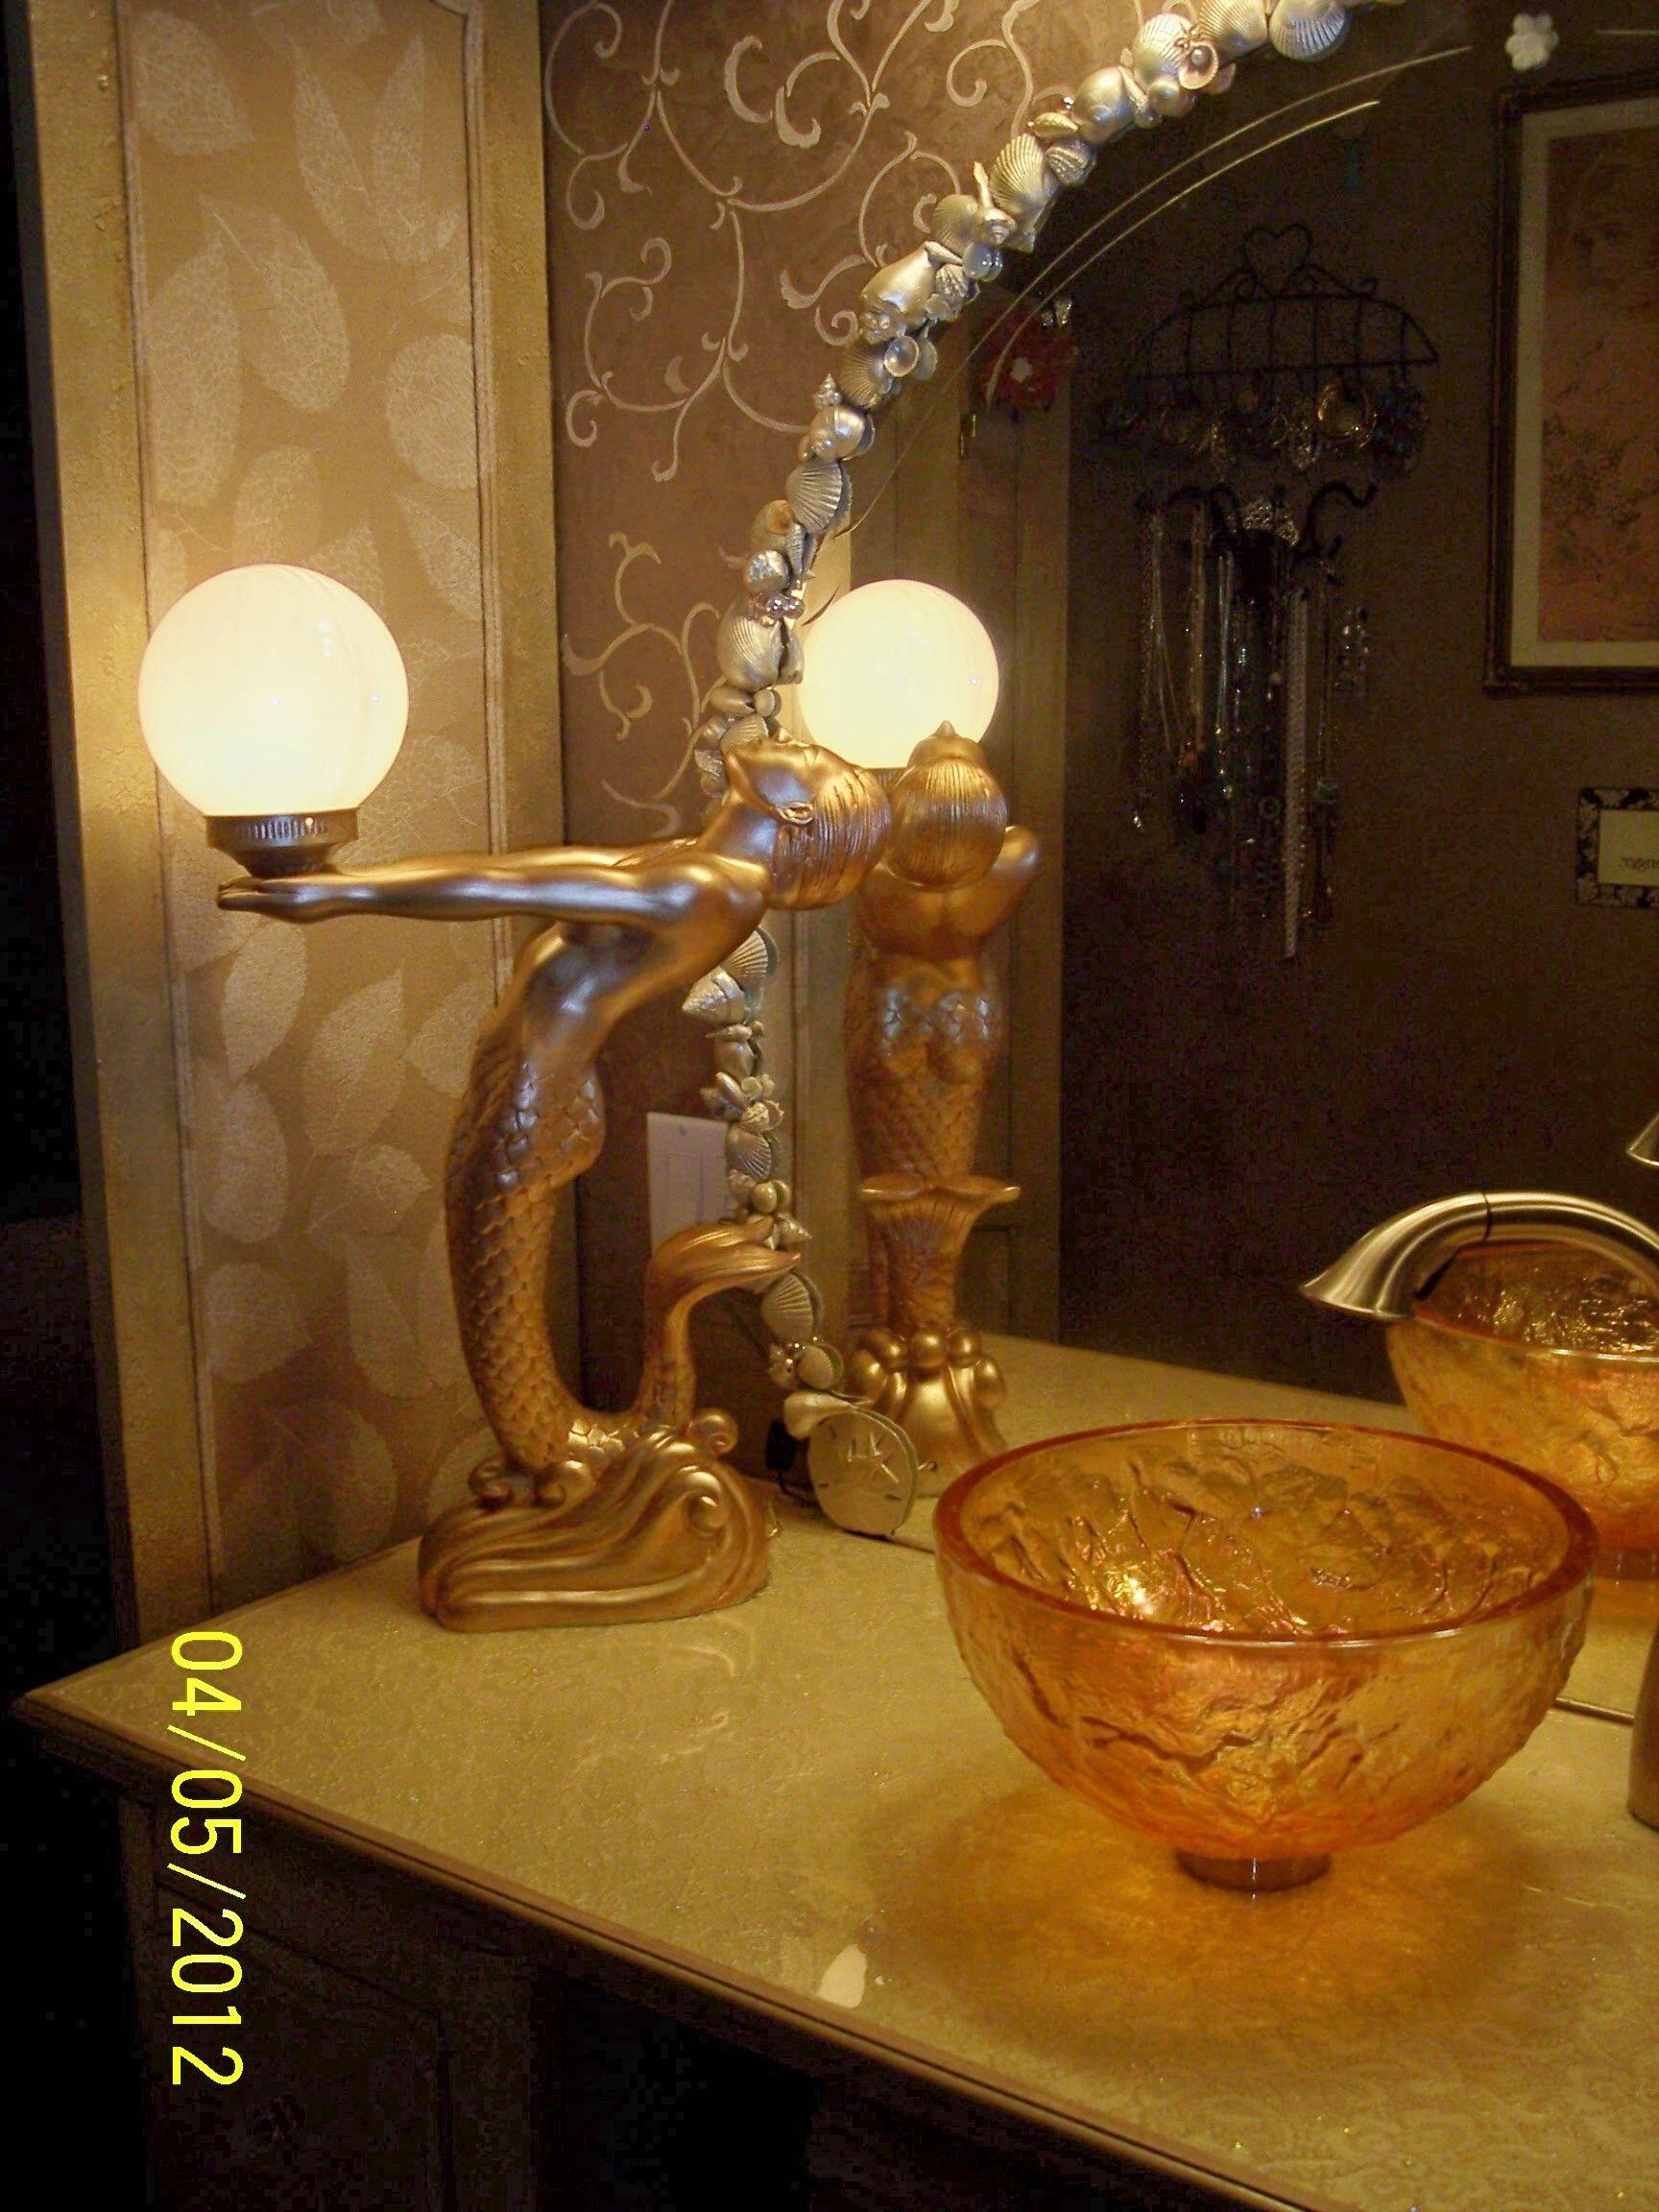 Mermaid table lamp - Mermaid Lamp